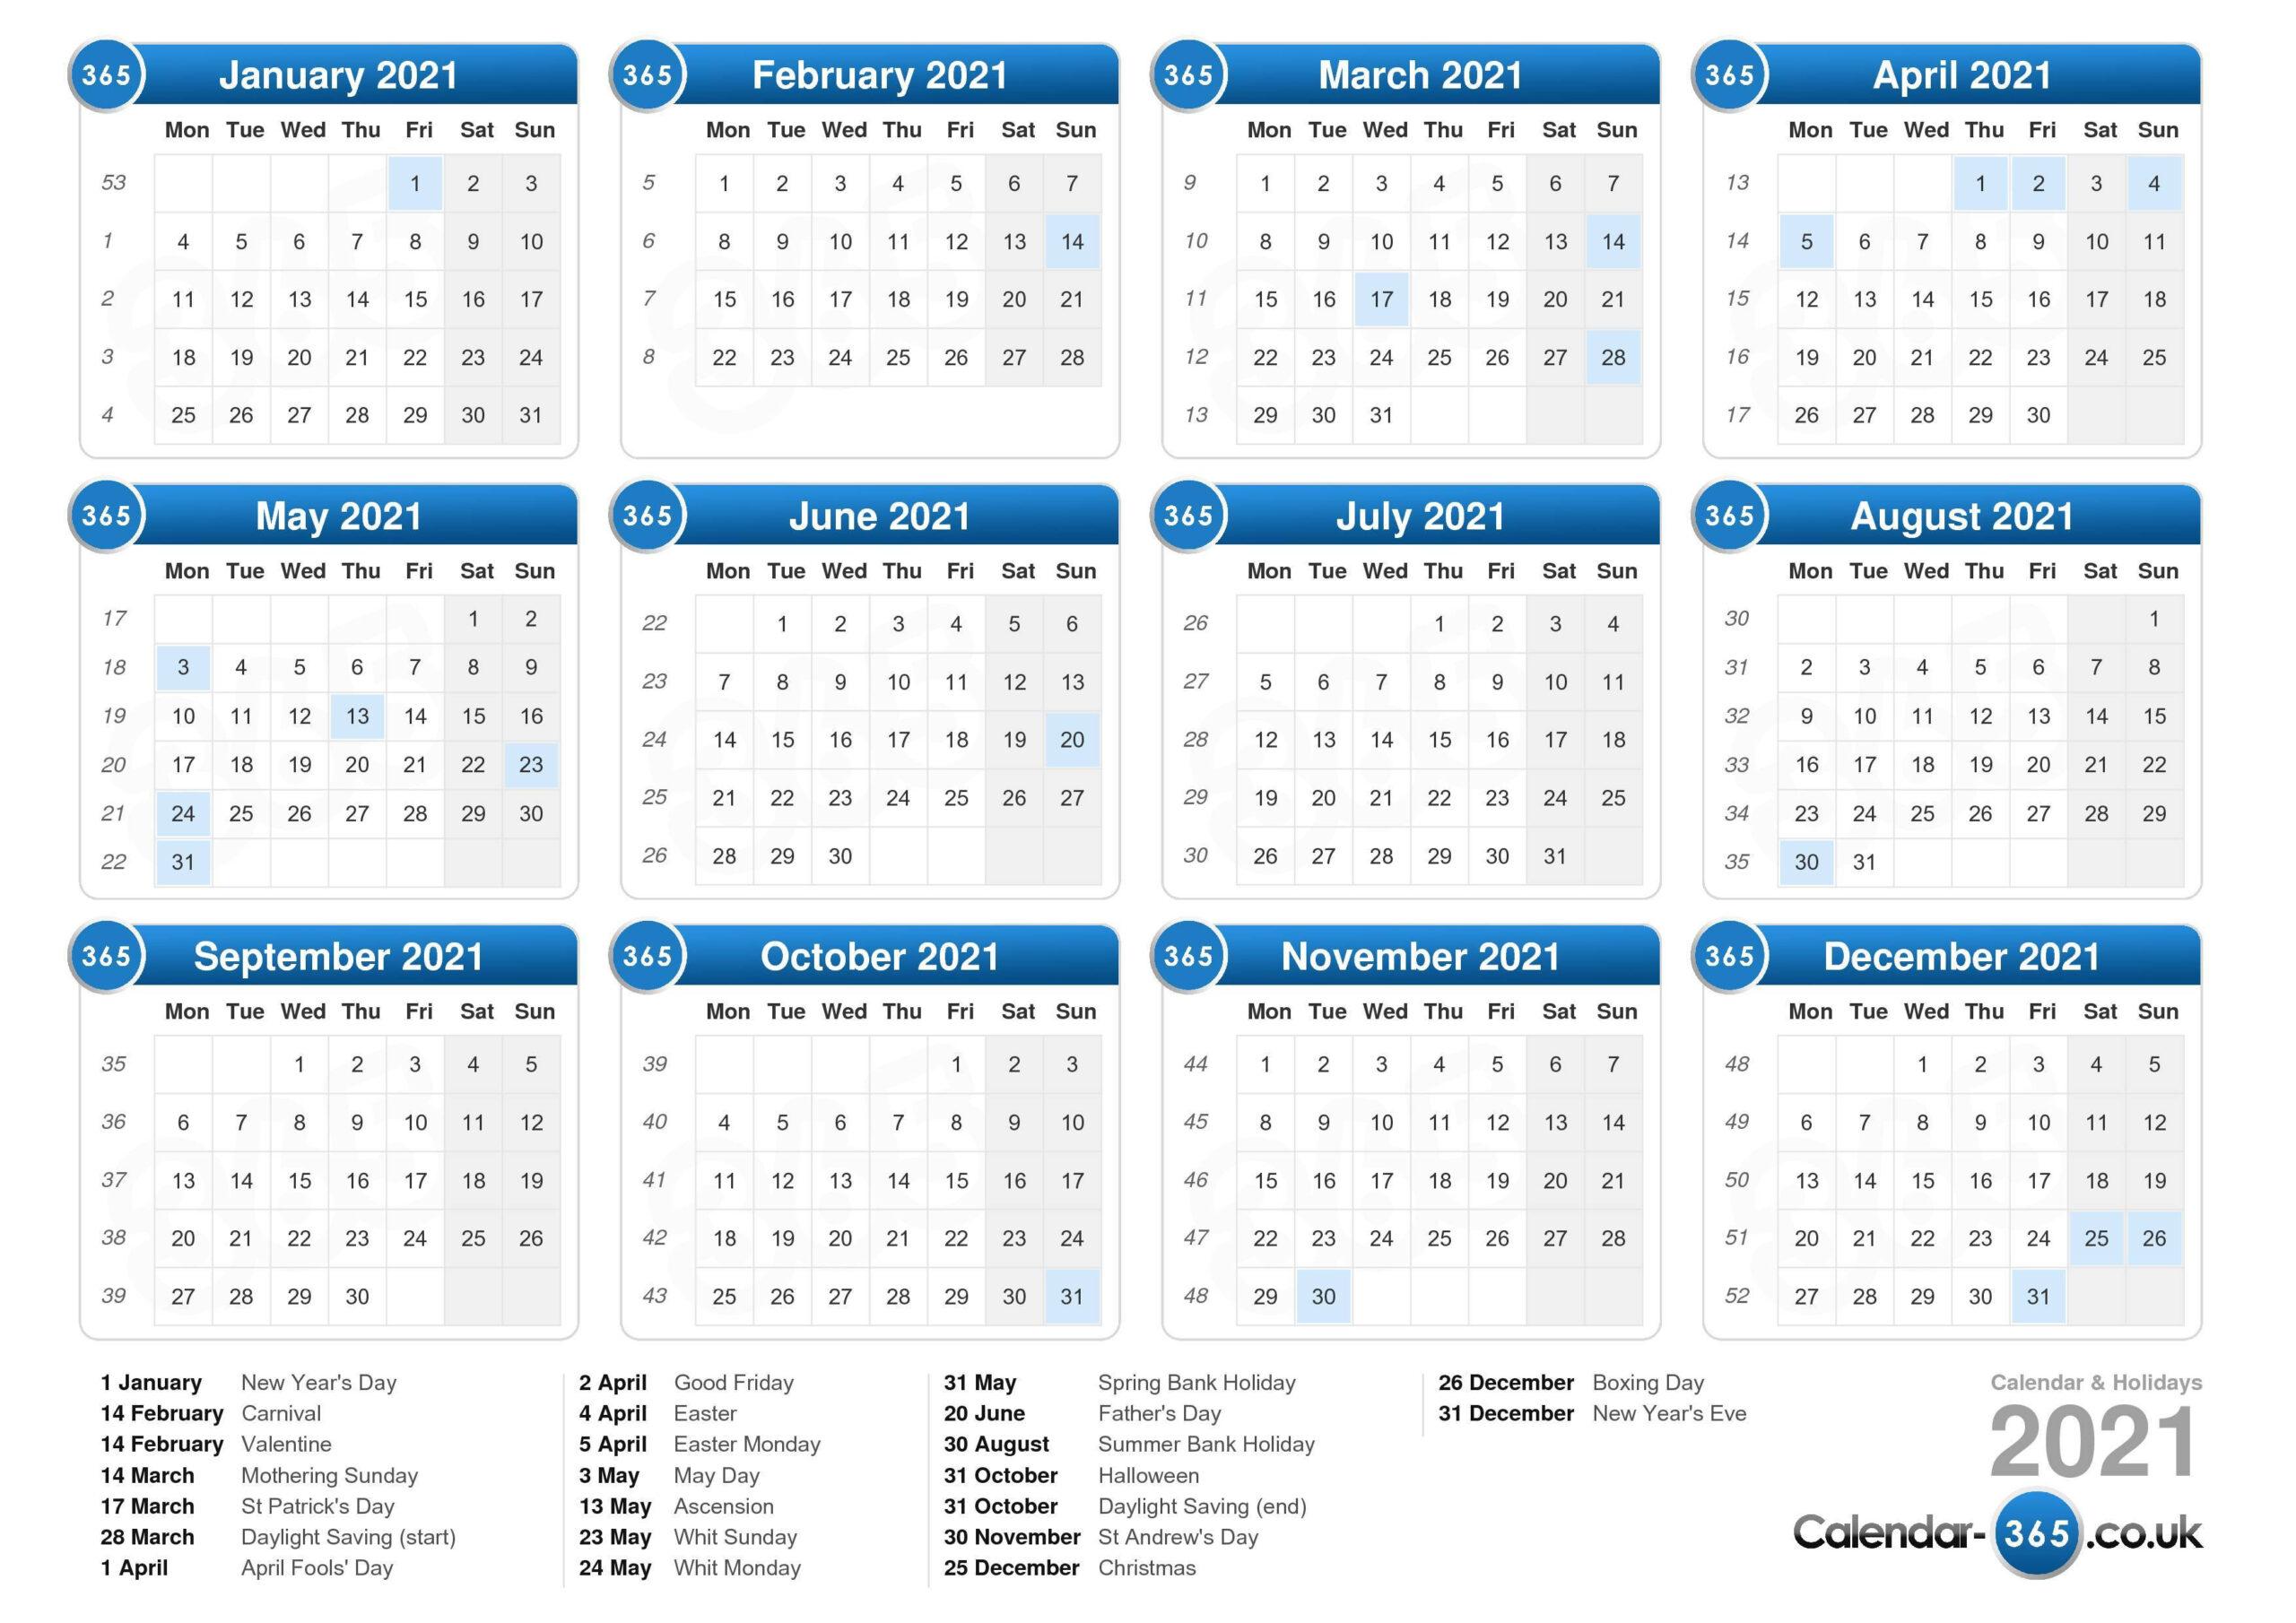 Calendar 2021-2021 Vacation Calendars